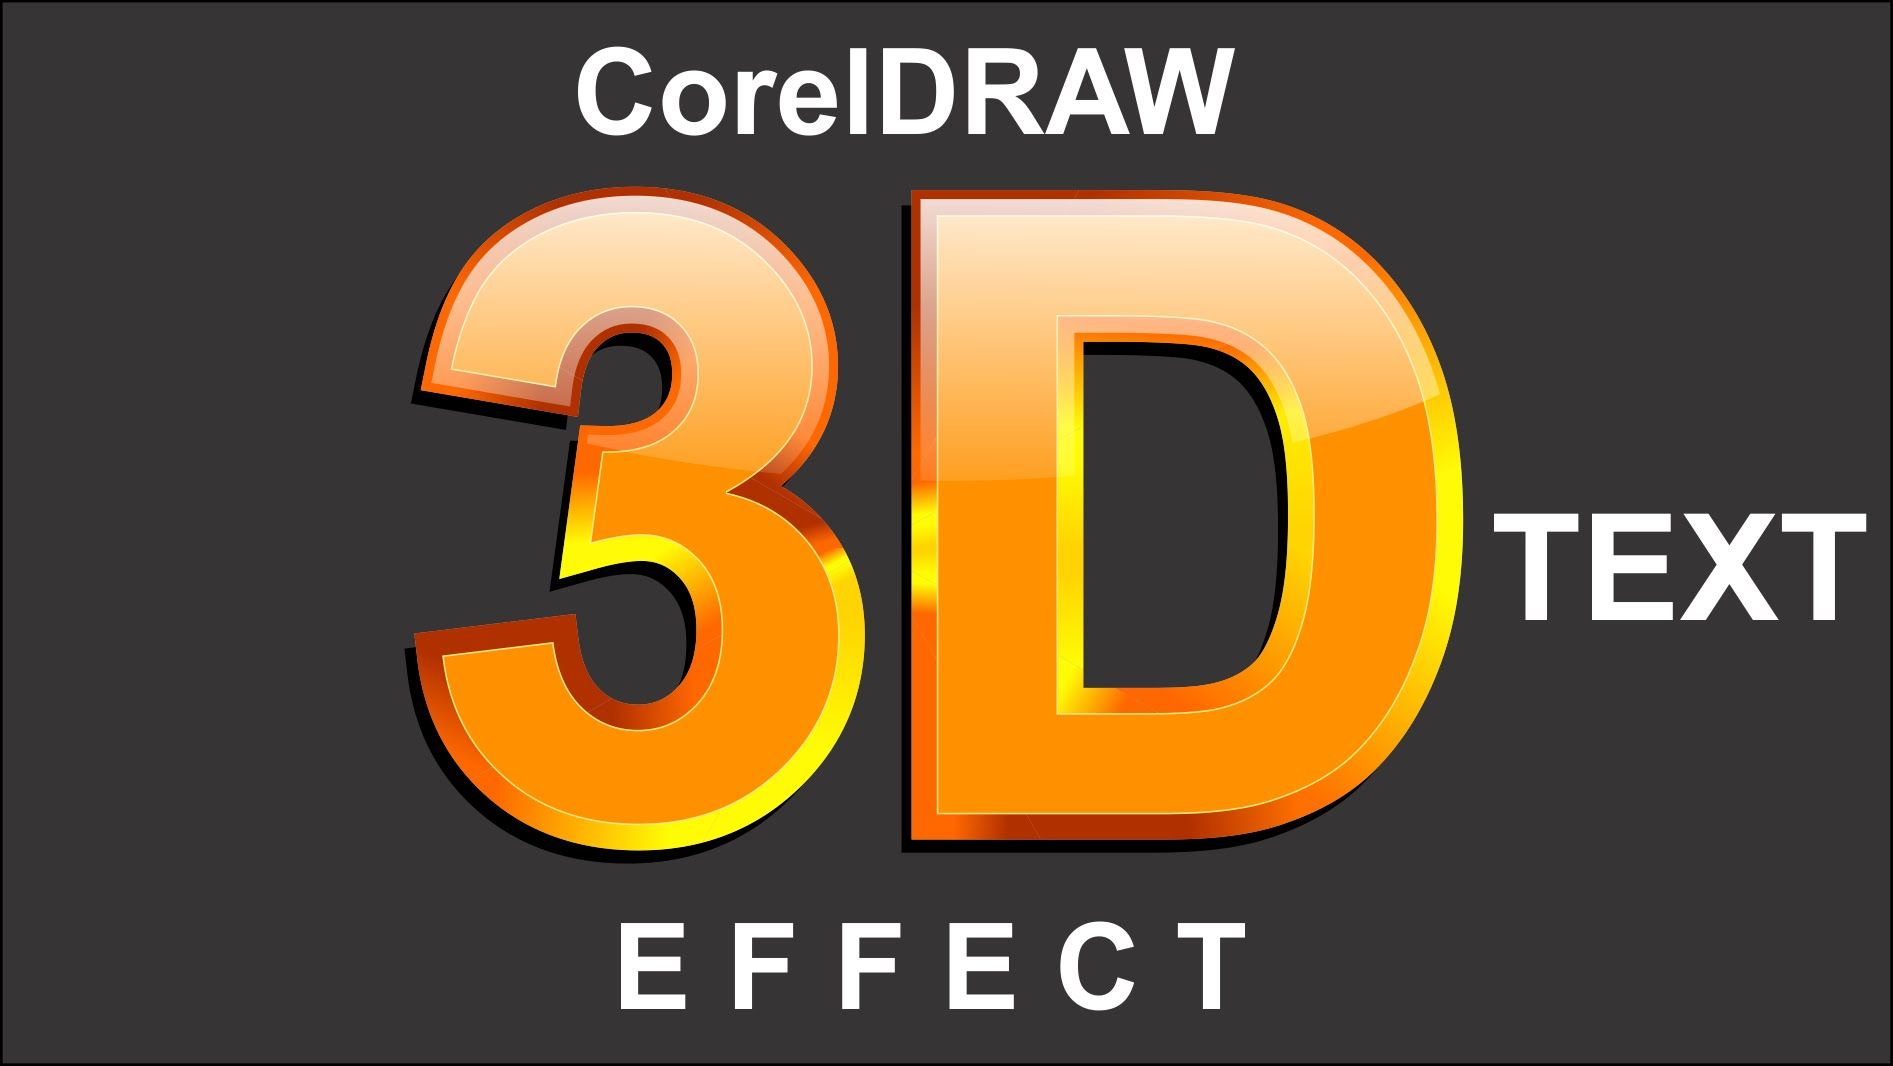 Coreldraw x8 3d text design effects corel draw font tutorial